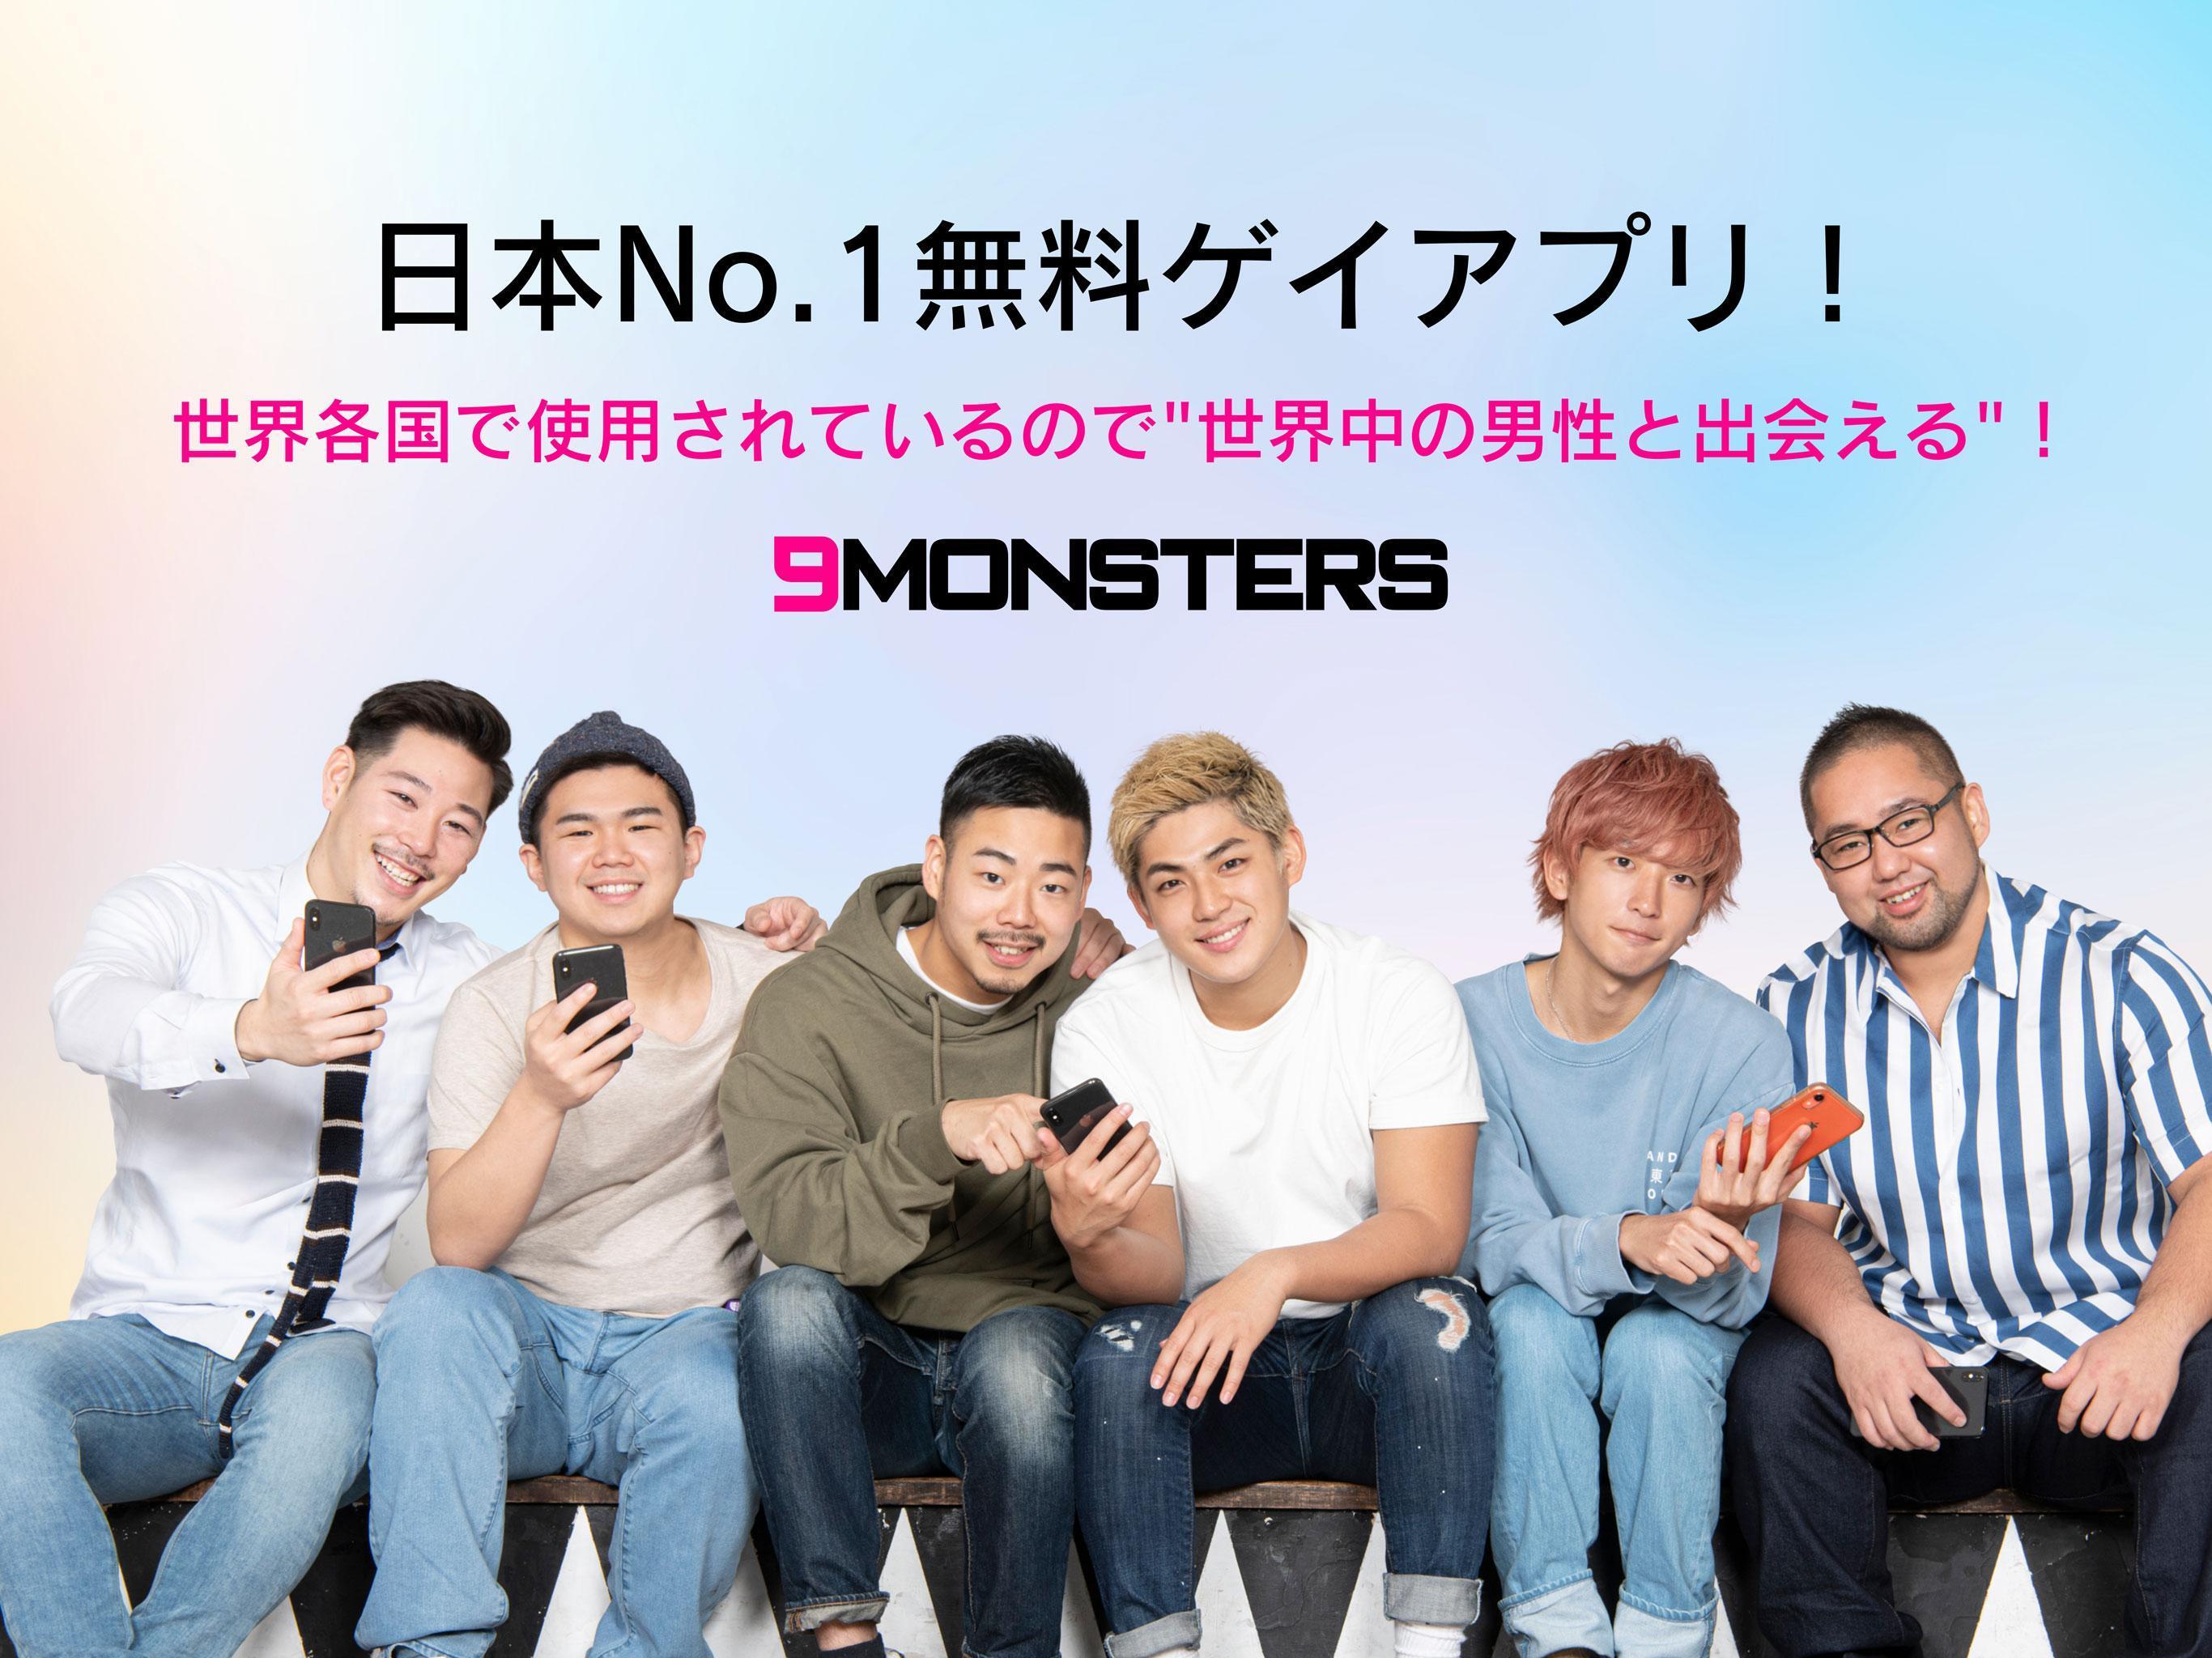 Android 用の 9monsters APK をダウンロード